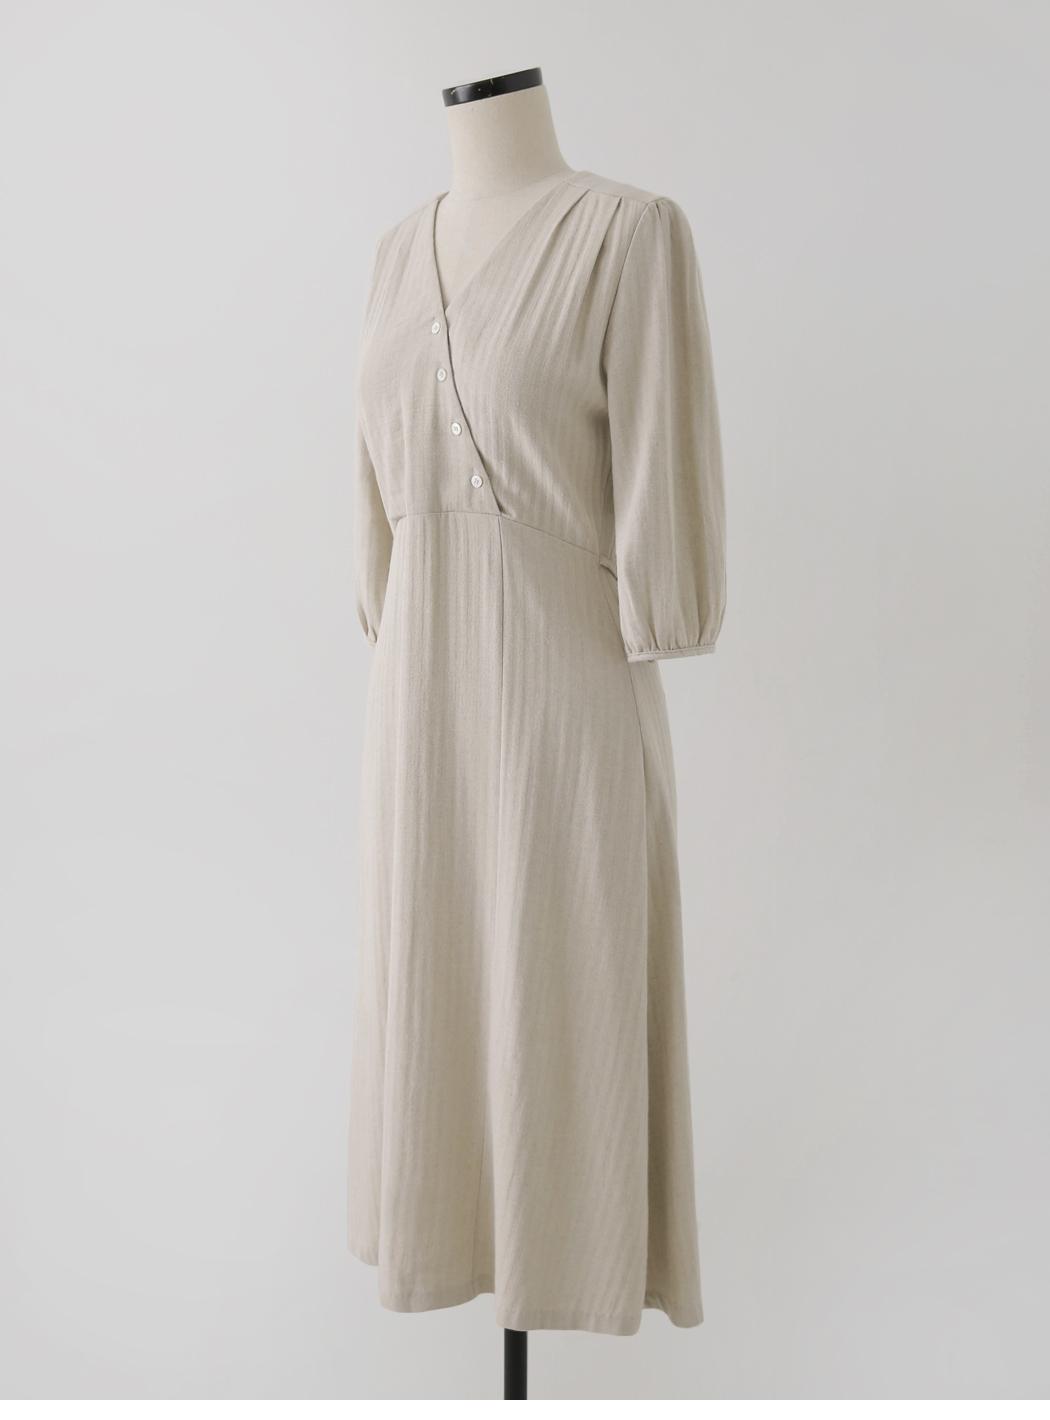 Cage diagonal wrap linen dress